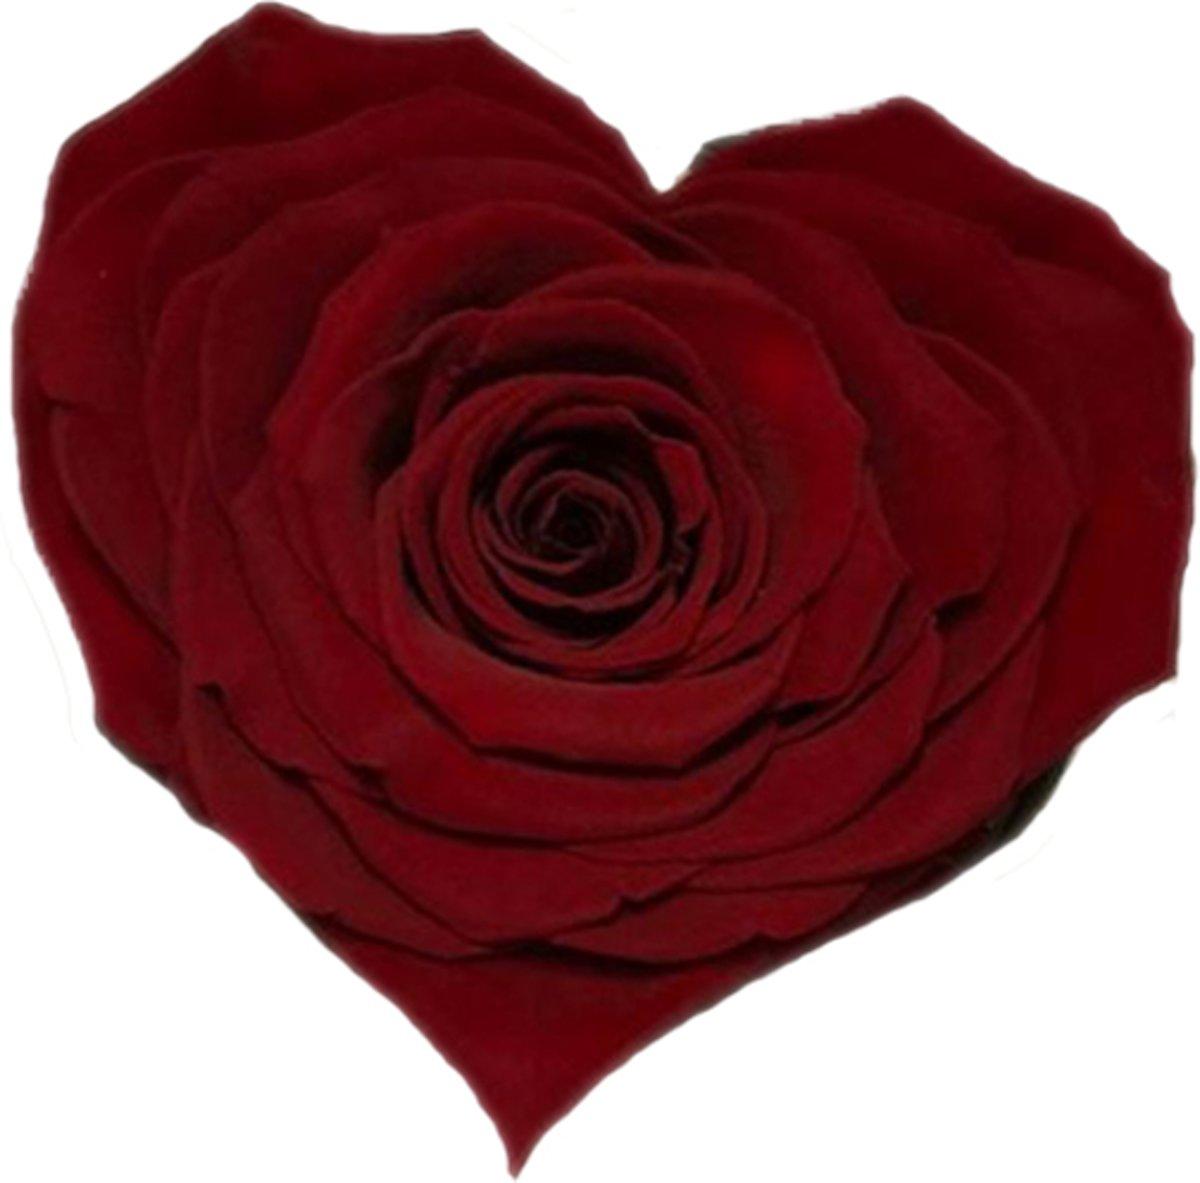 Donker rode rozen kop in hartvorm kopen